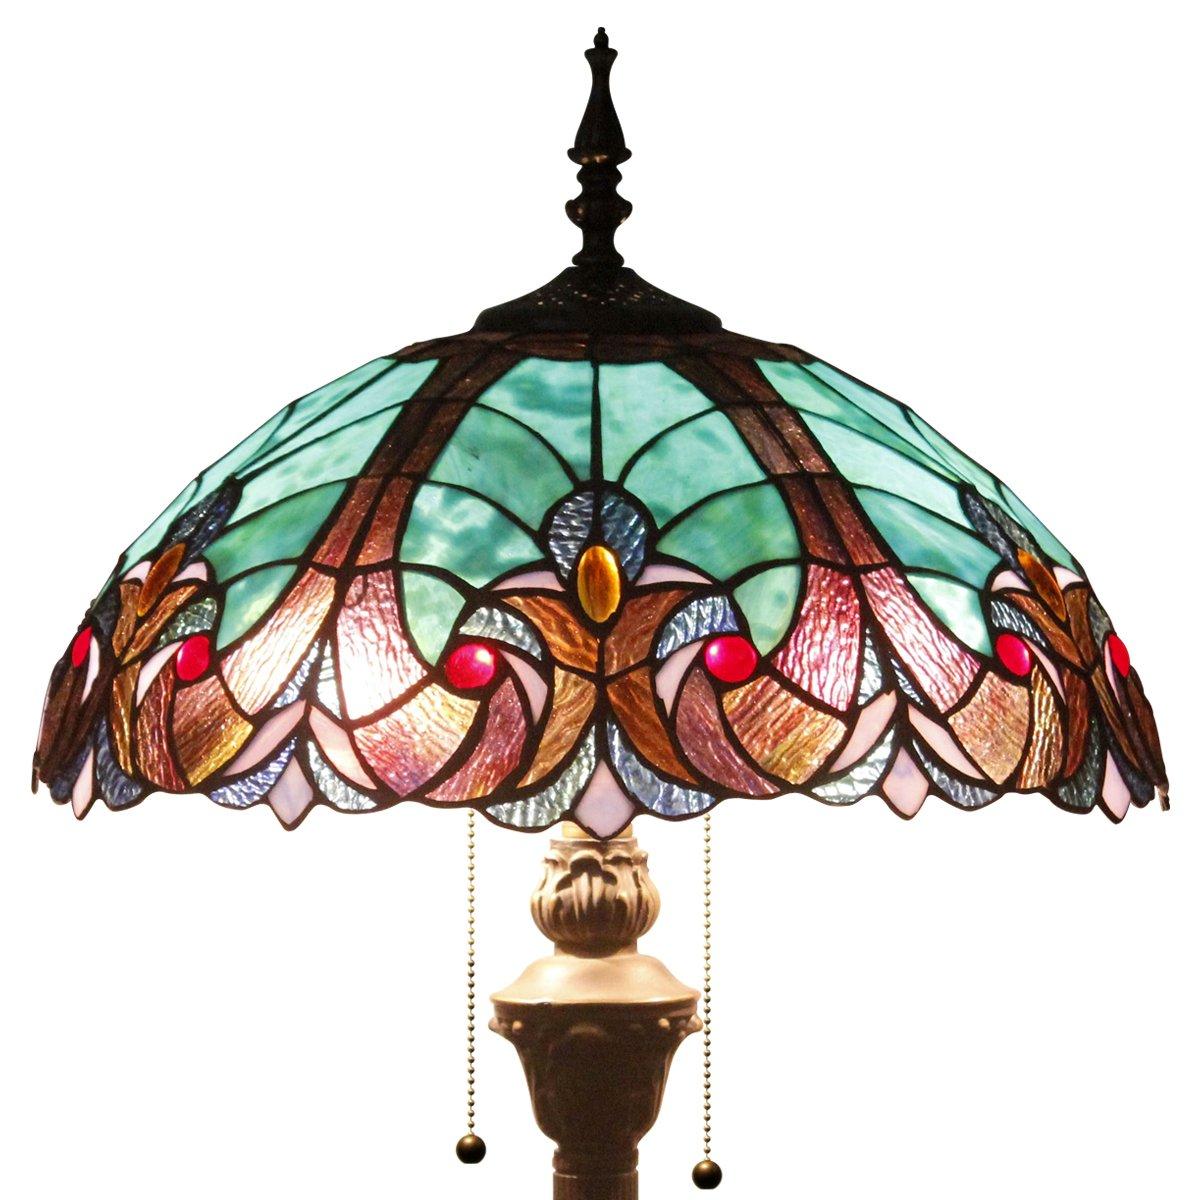 Tiffany Style Reading Floor Lamp Table Desk Lighting GREEN LIAISON W16H64 E26